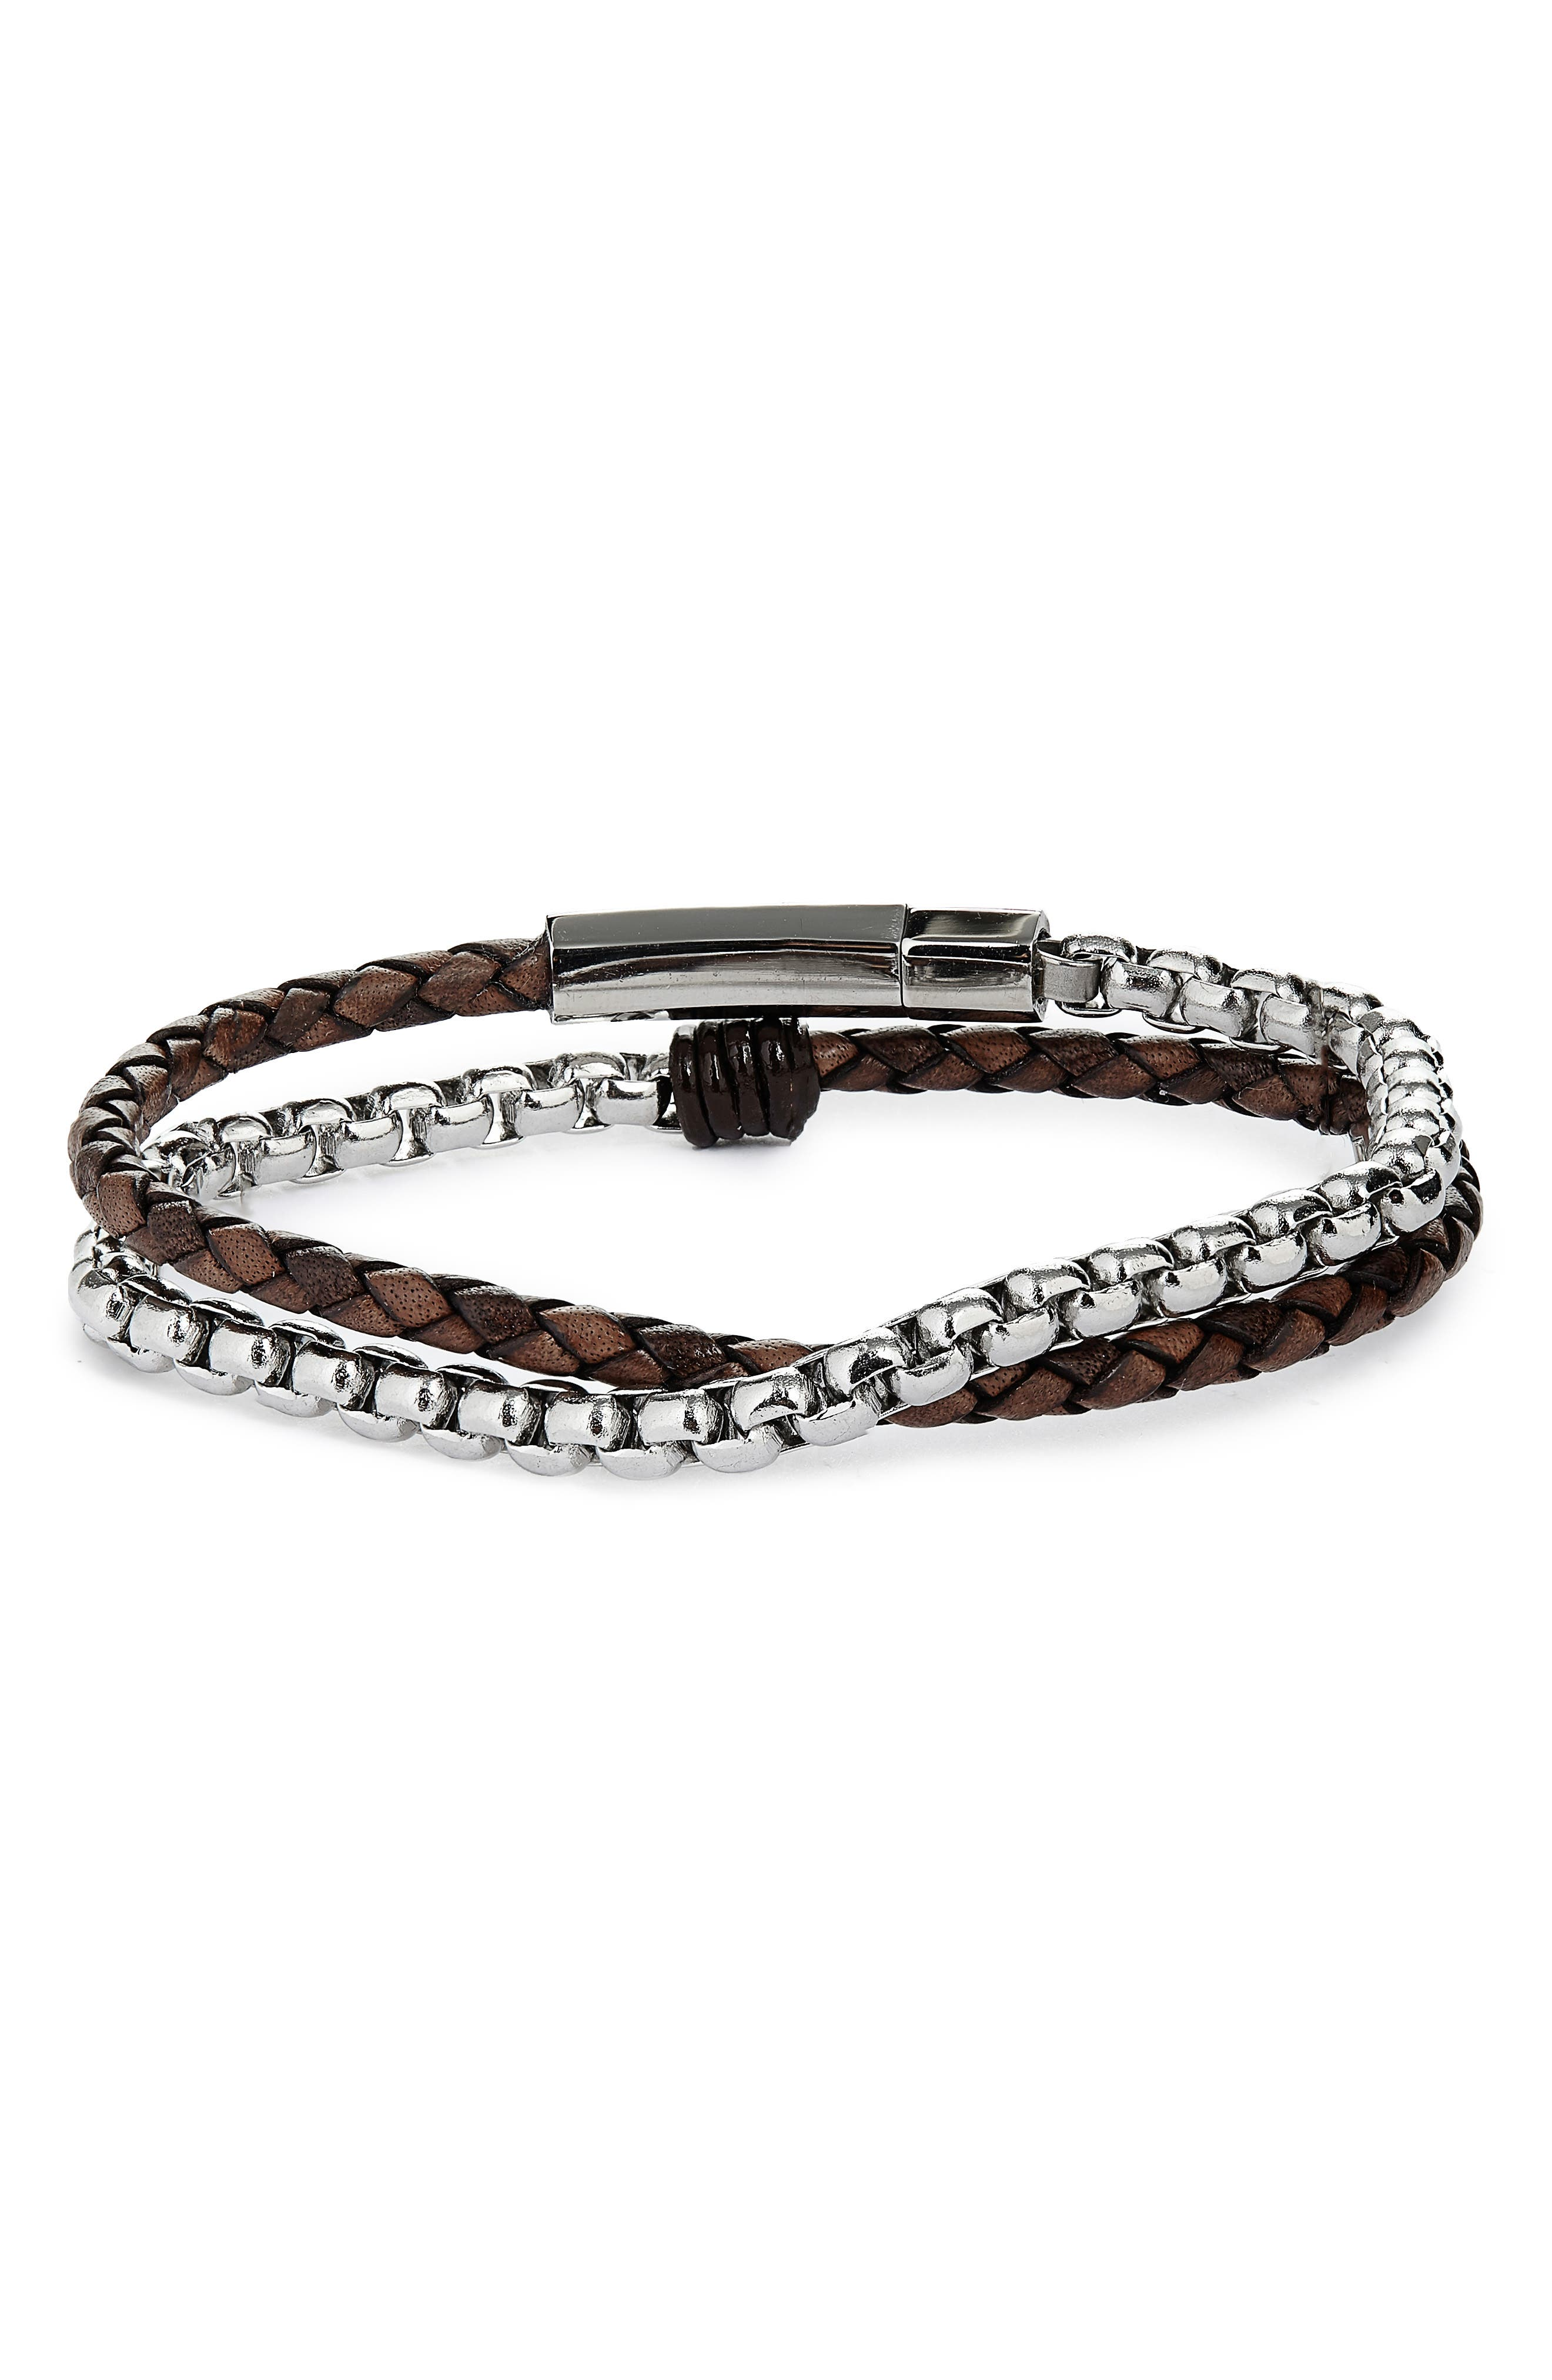 Braided Leather & Chain Double Wrap Bracelet